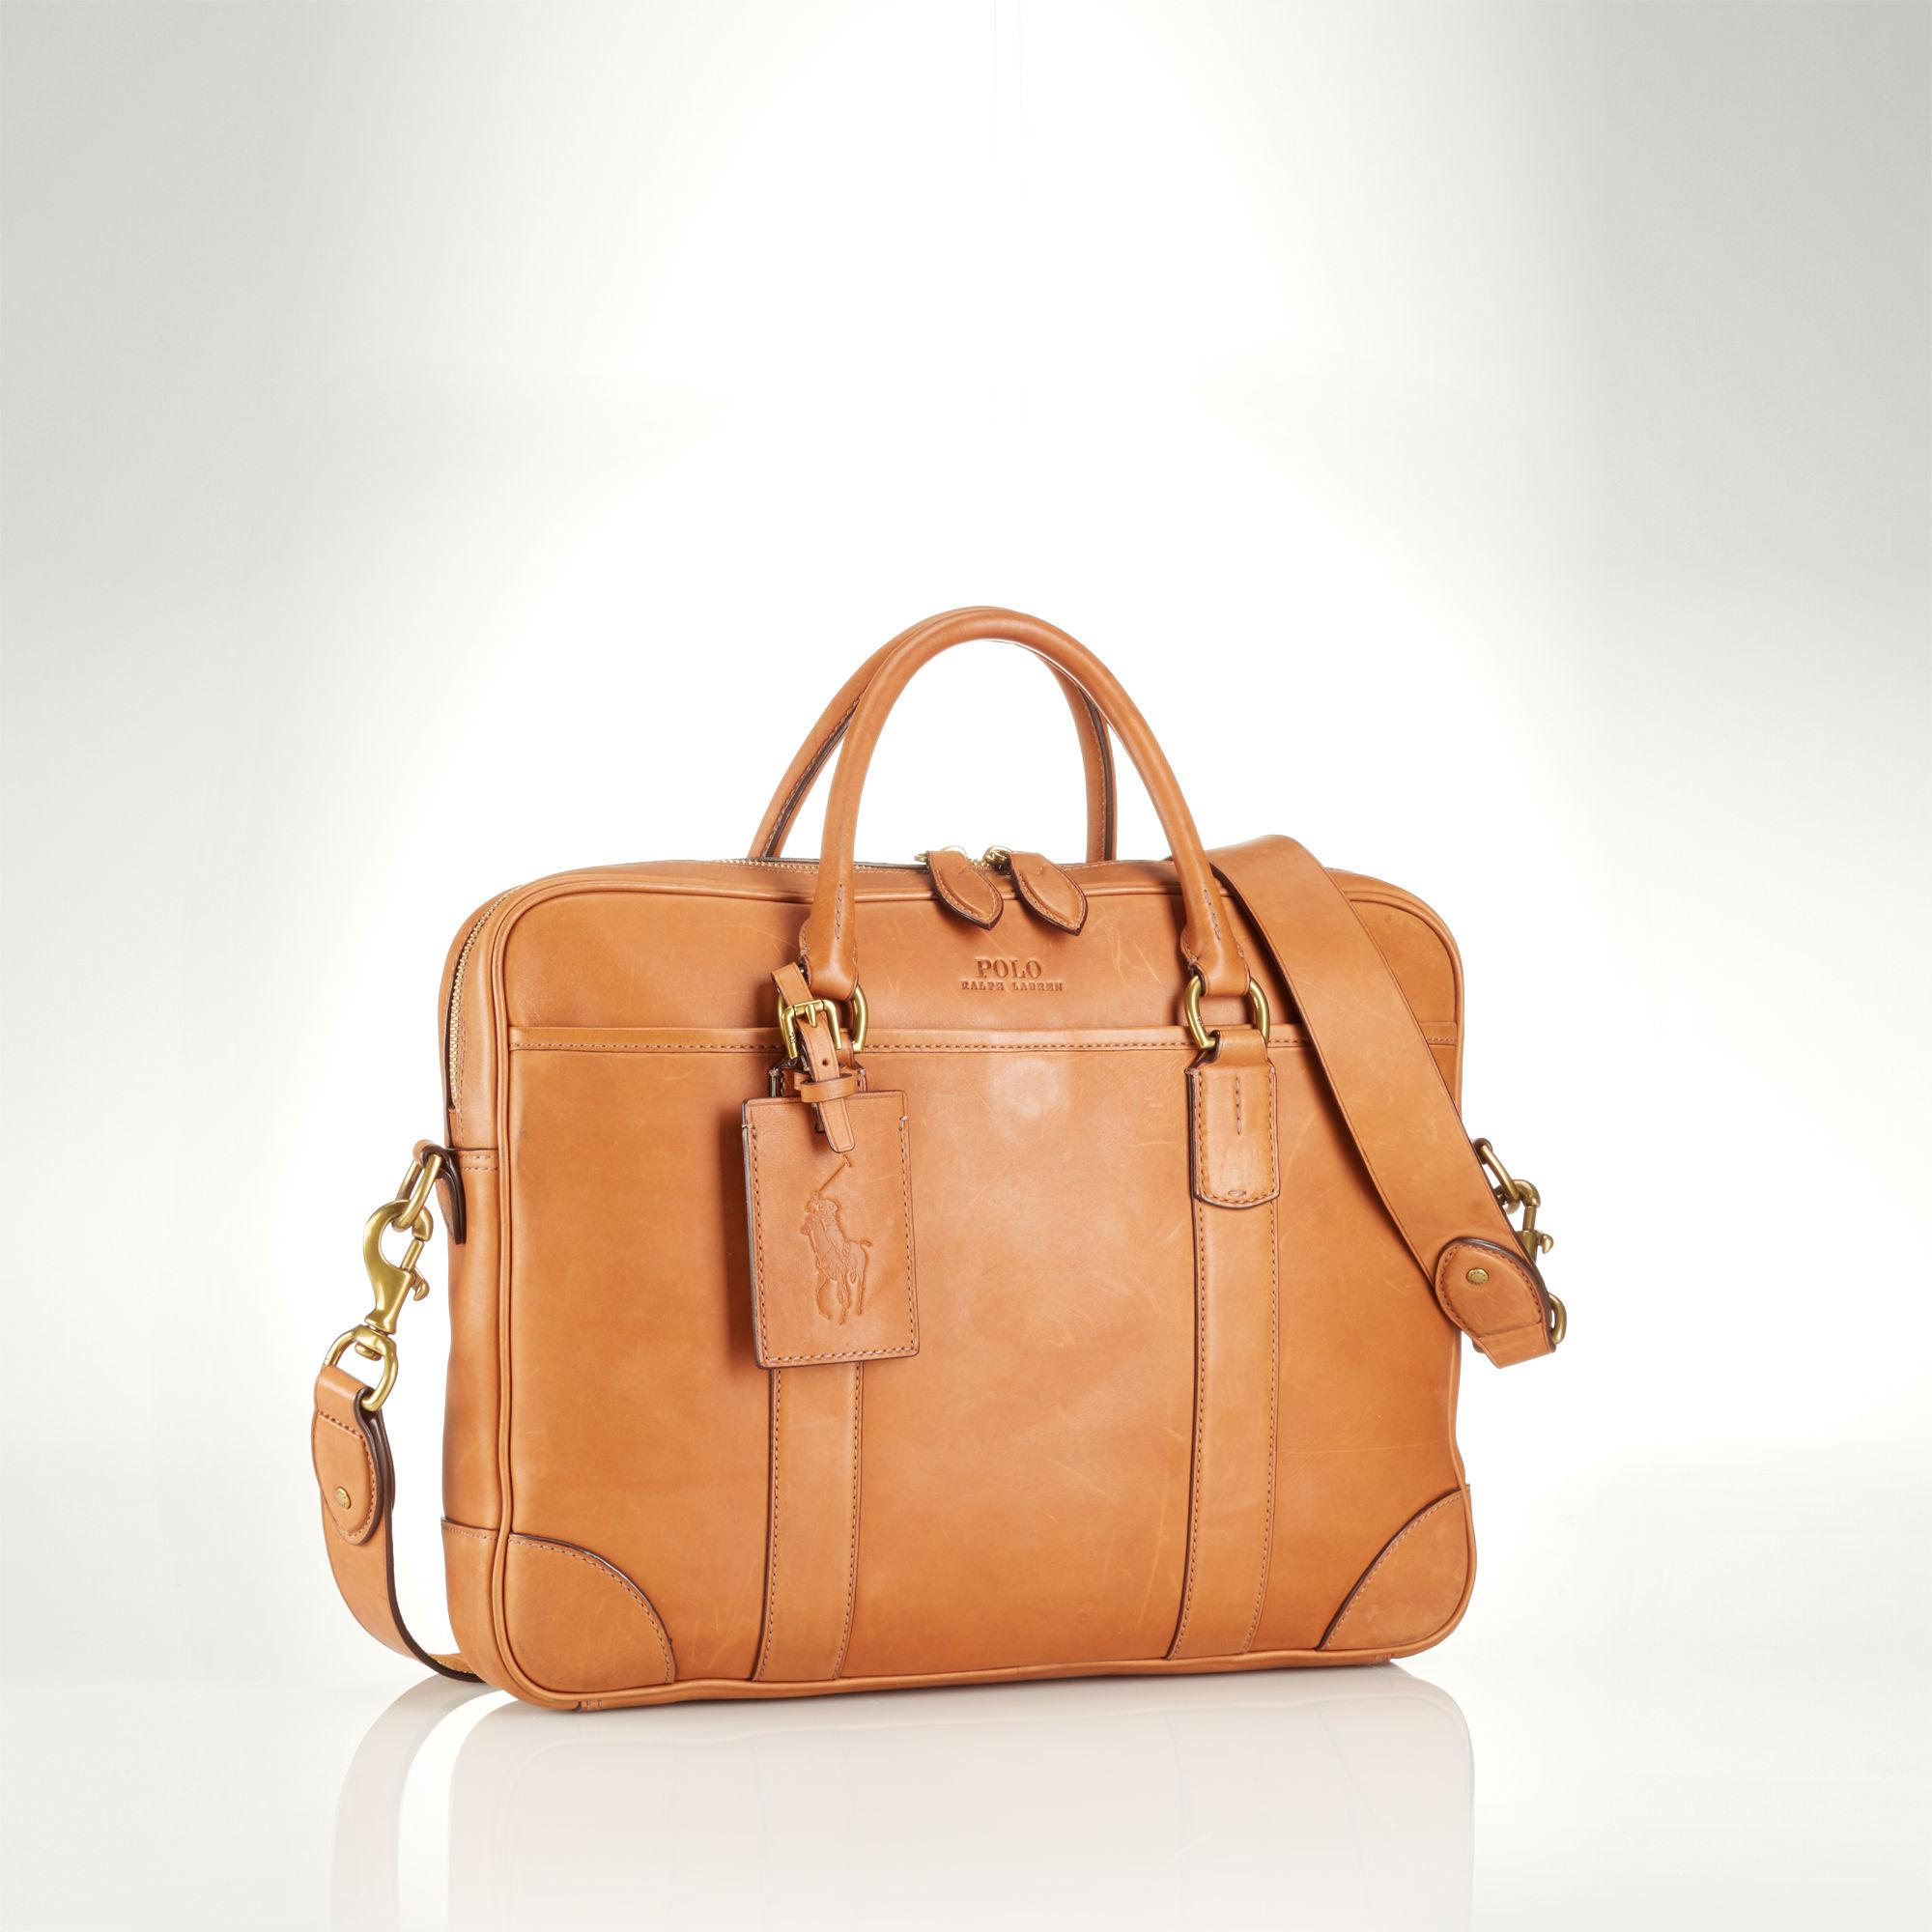 Popular Longchamp Le Pliage Tote Bags 1899 089 226 CAMEL